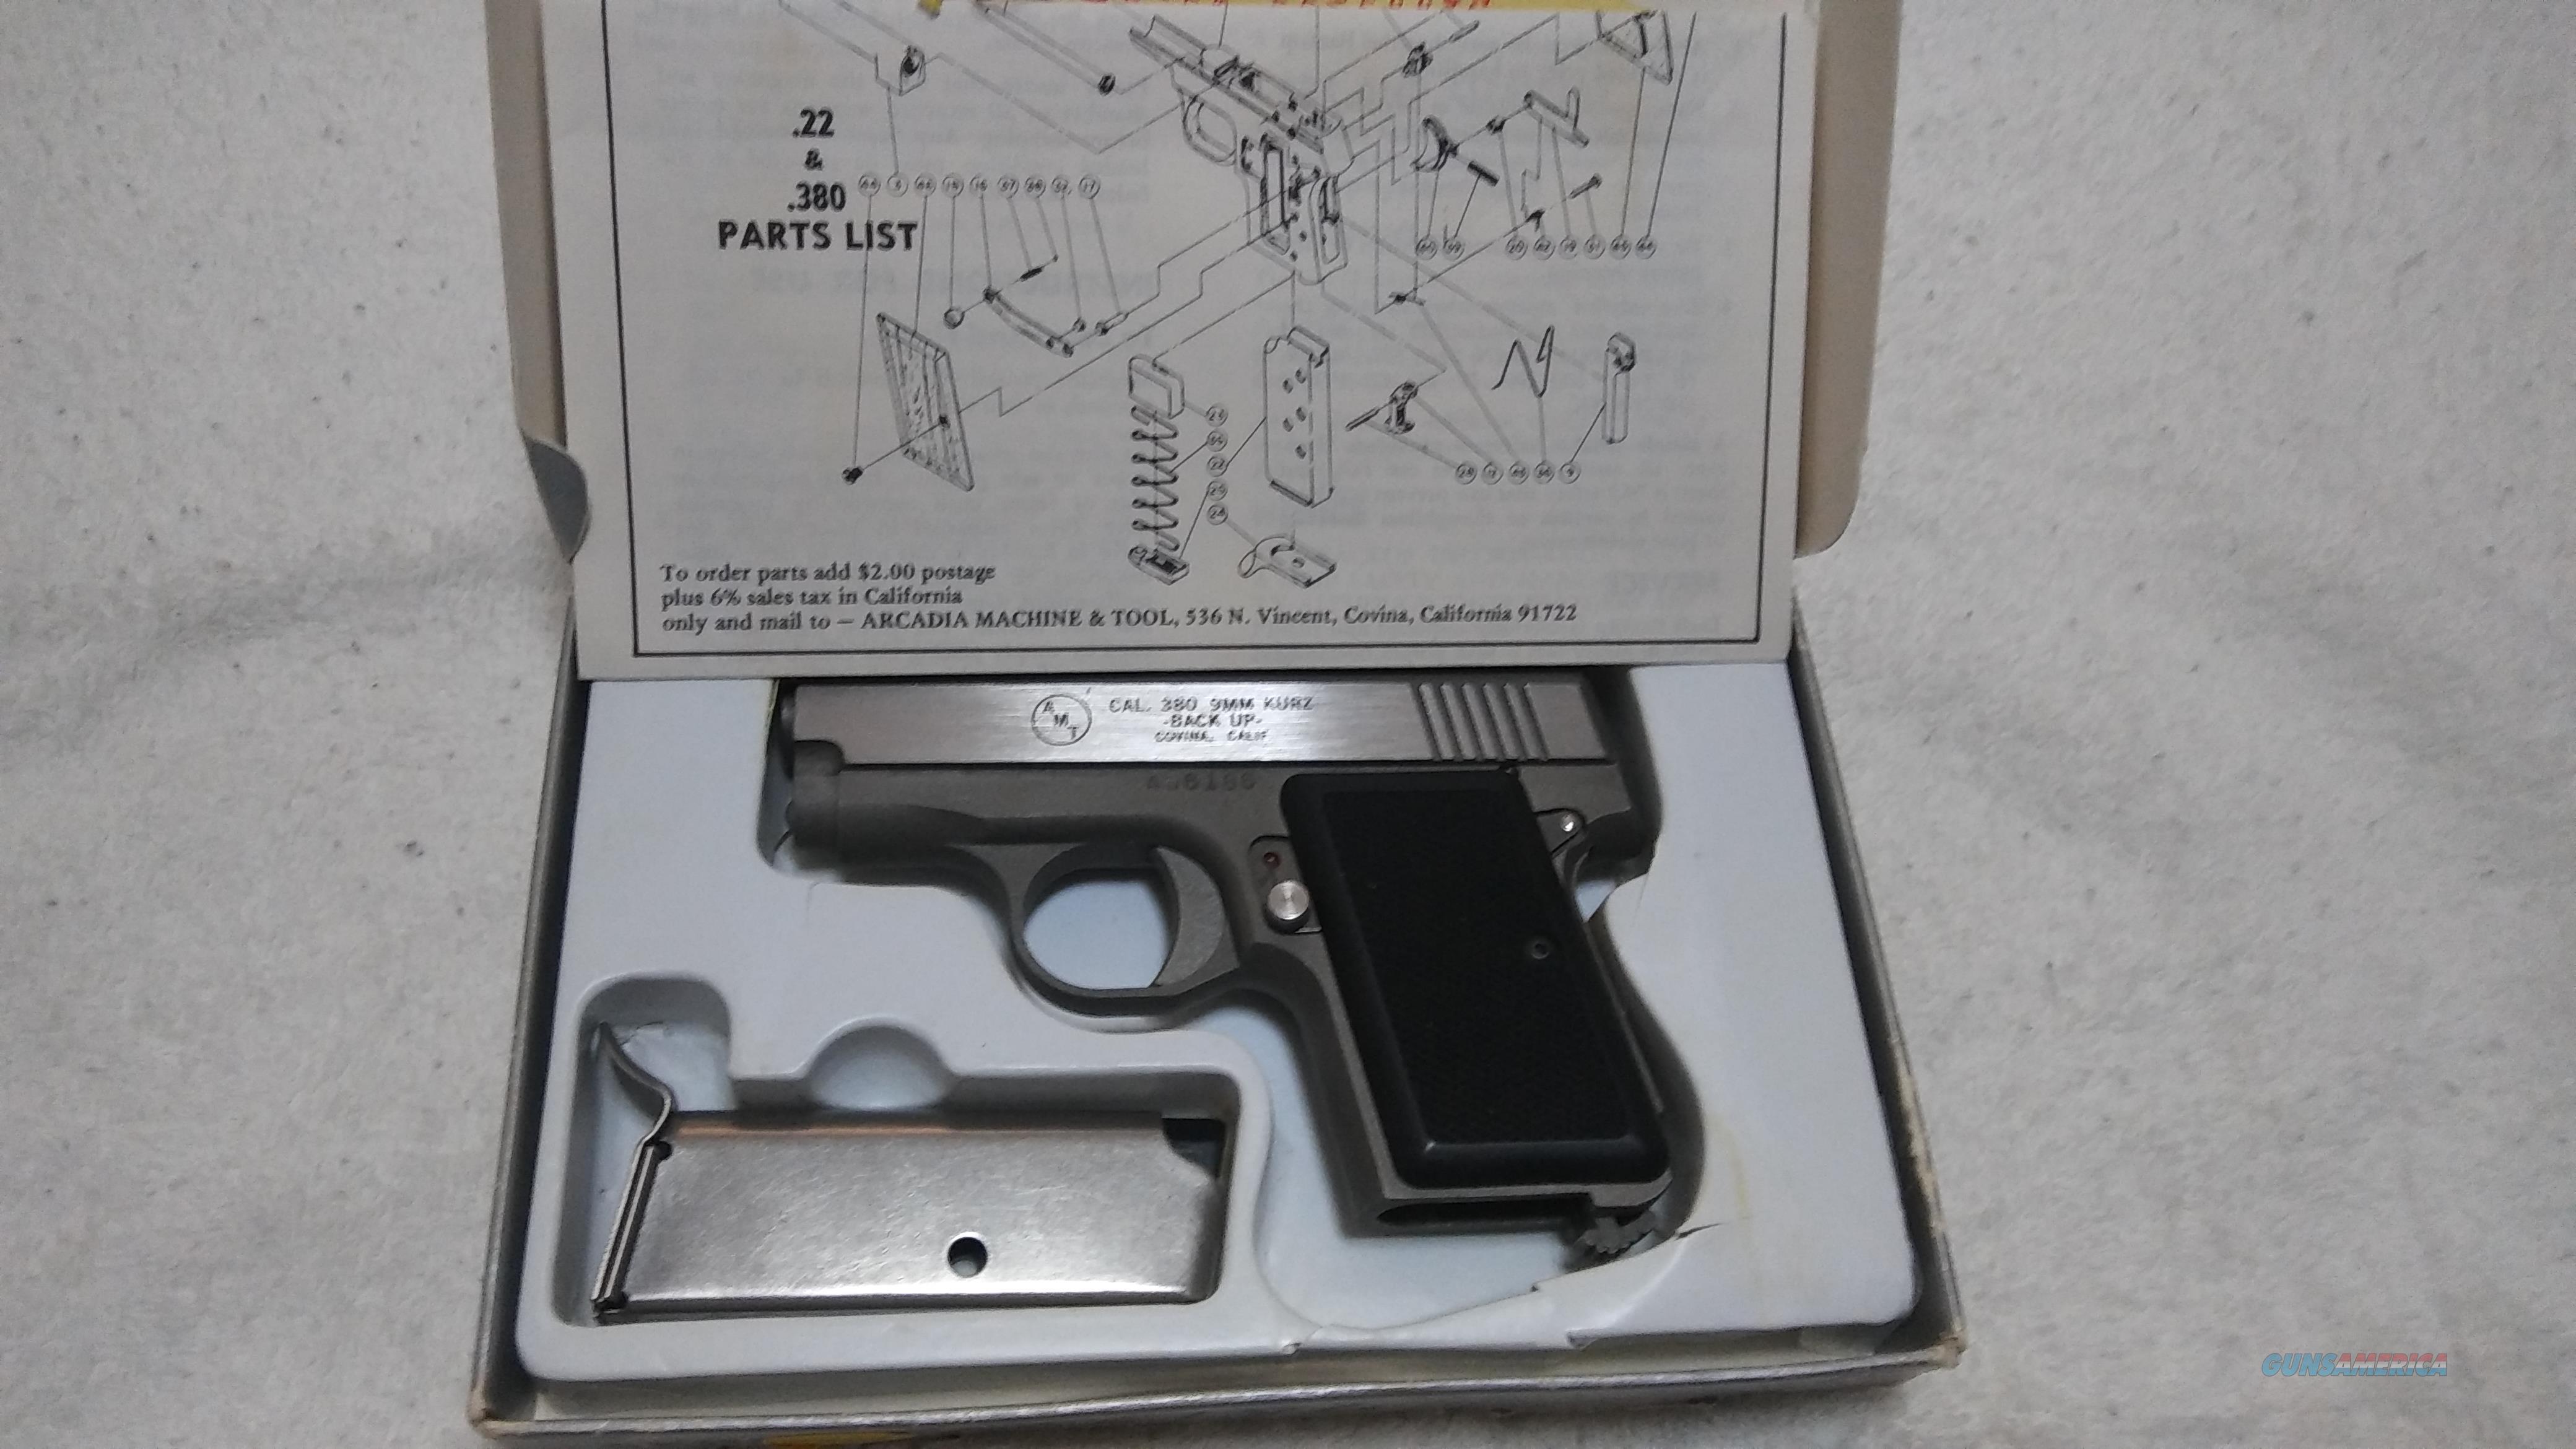 AMT 380 back up new in a box  Guns > Pistols > AMT Pistols > 1911 copies